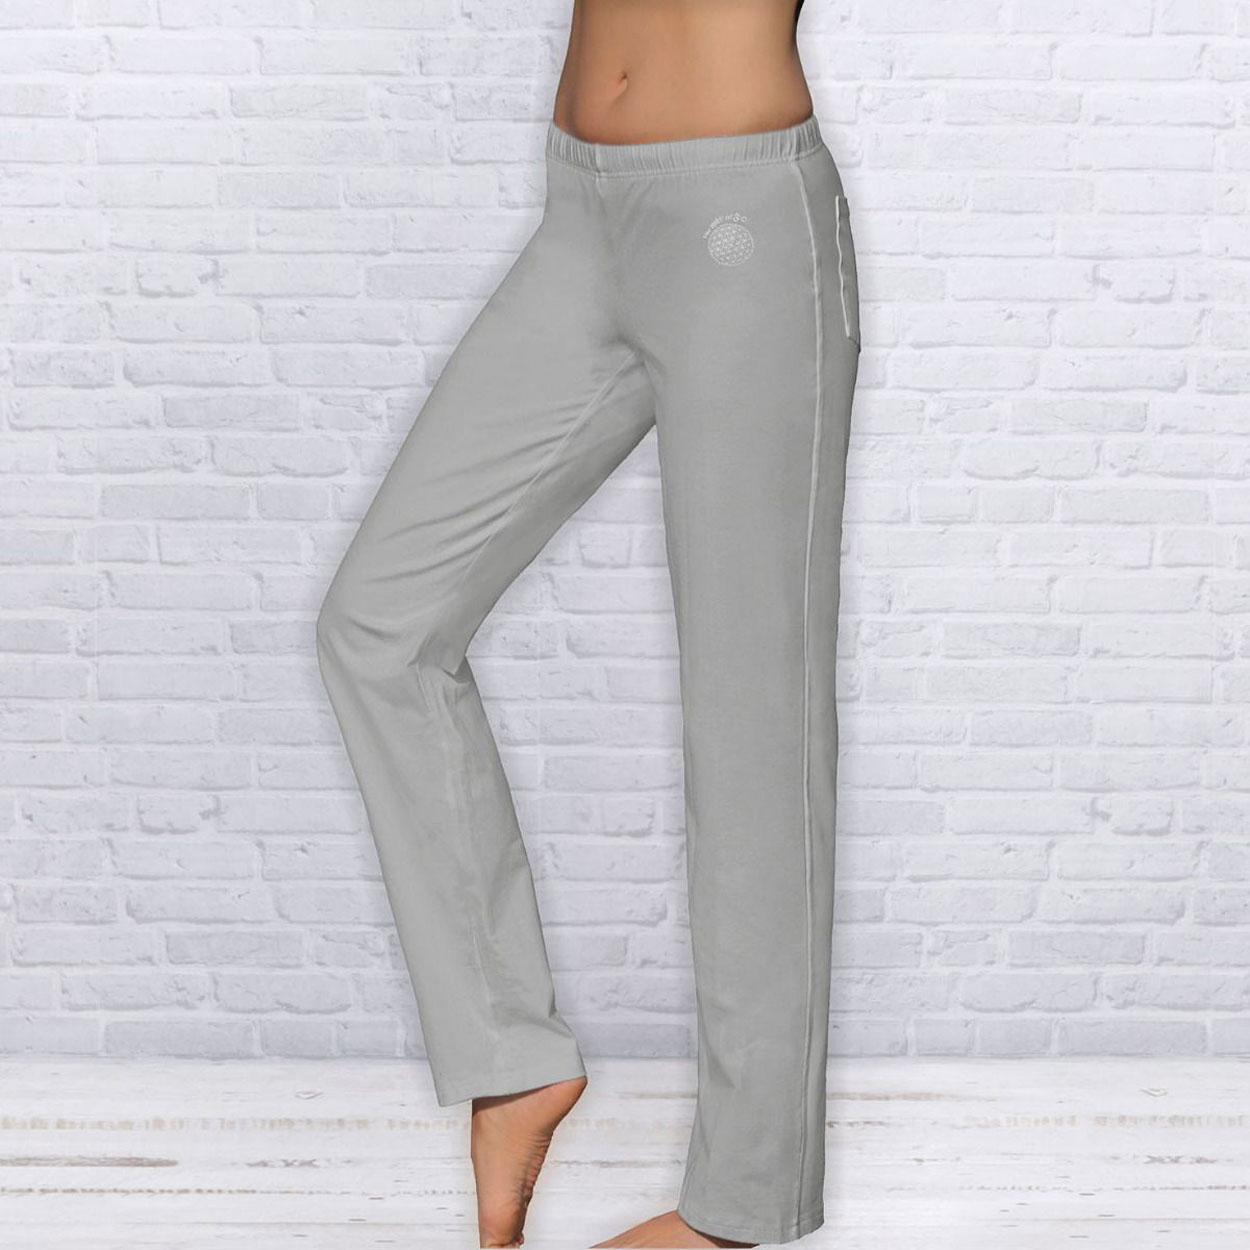 Wellness Yoga pants unisex, Silver Grey